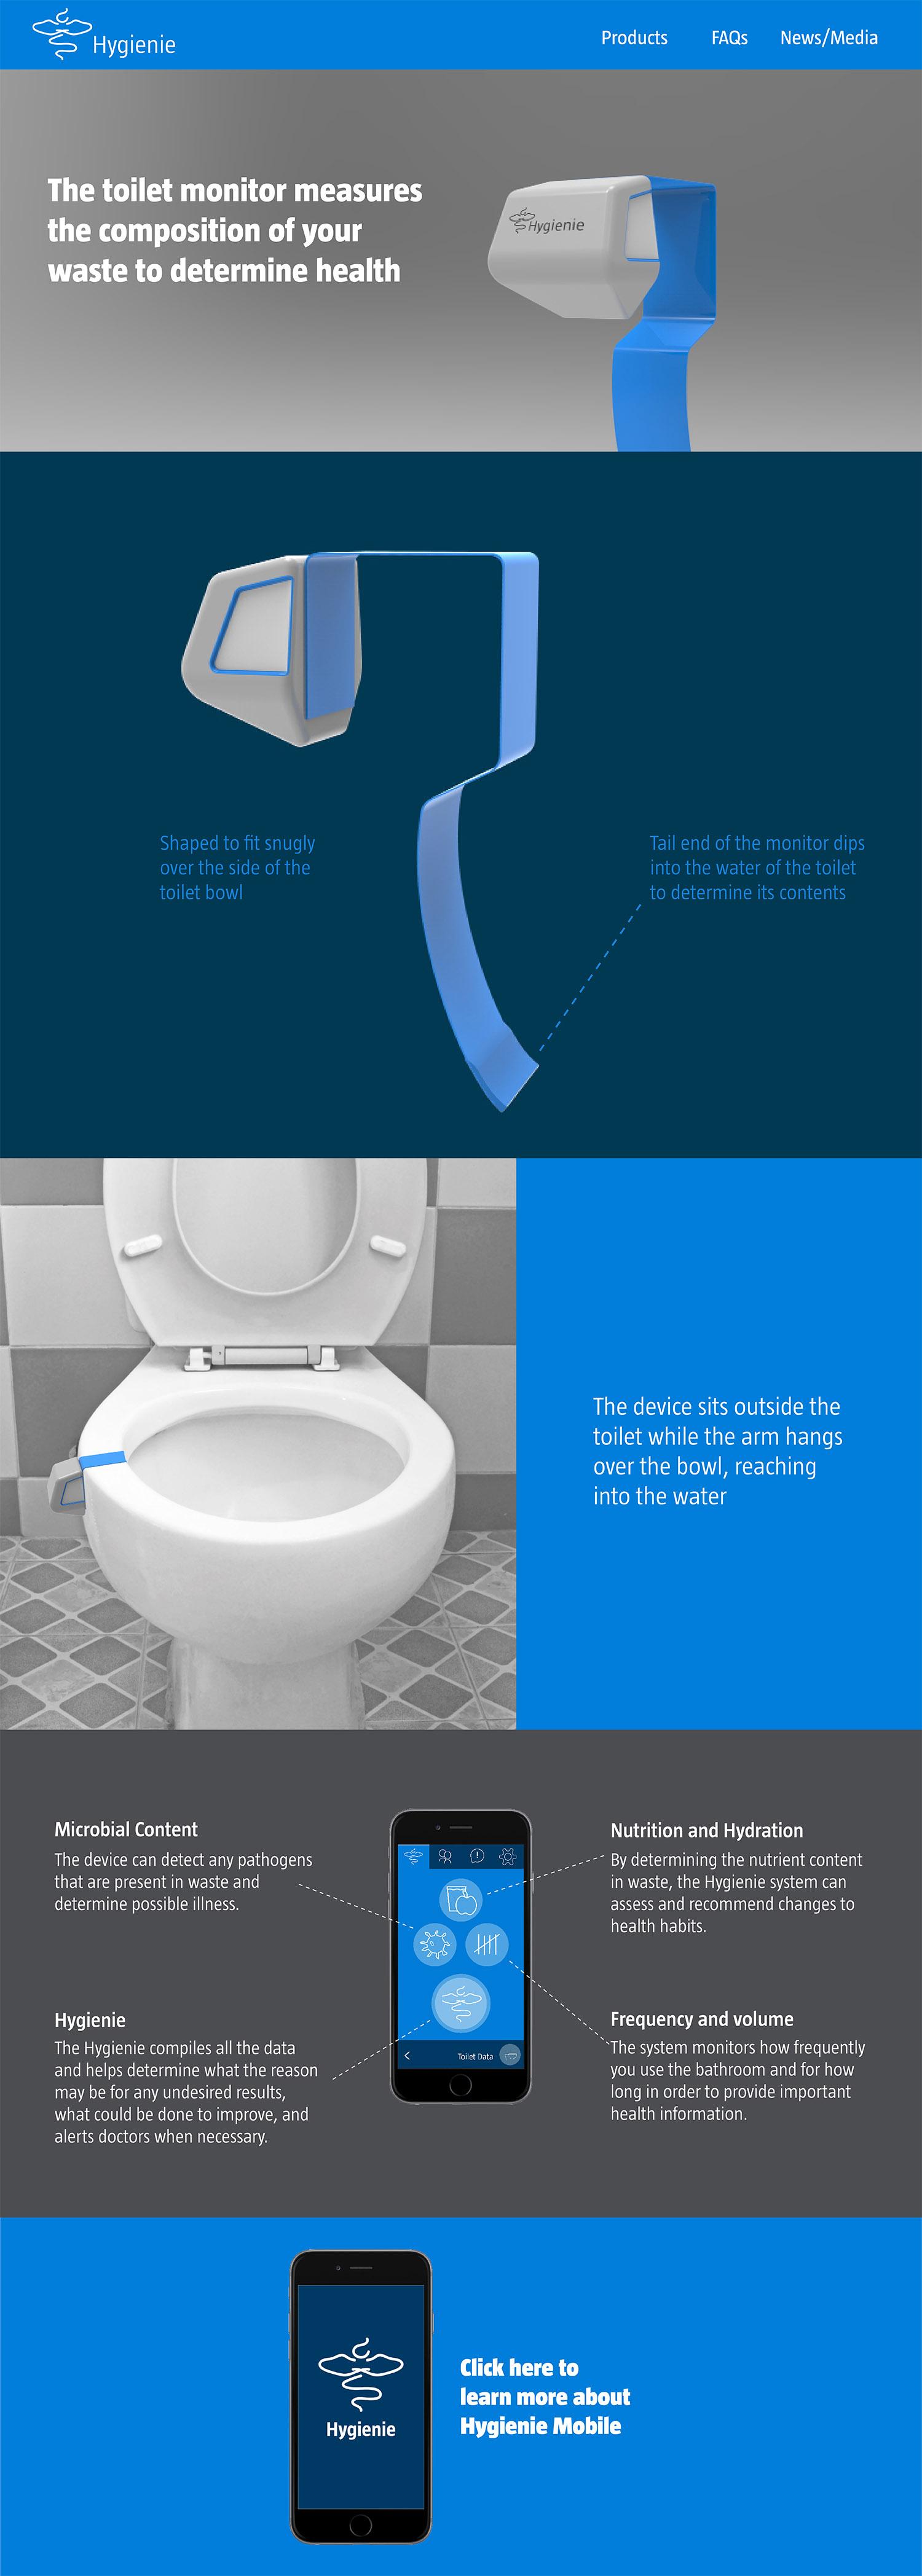 Hygienie webpages 15.jpg